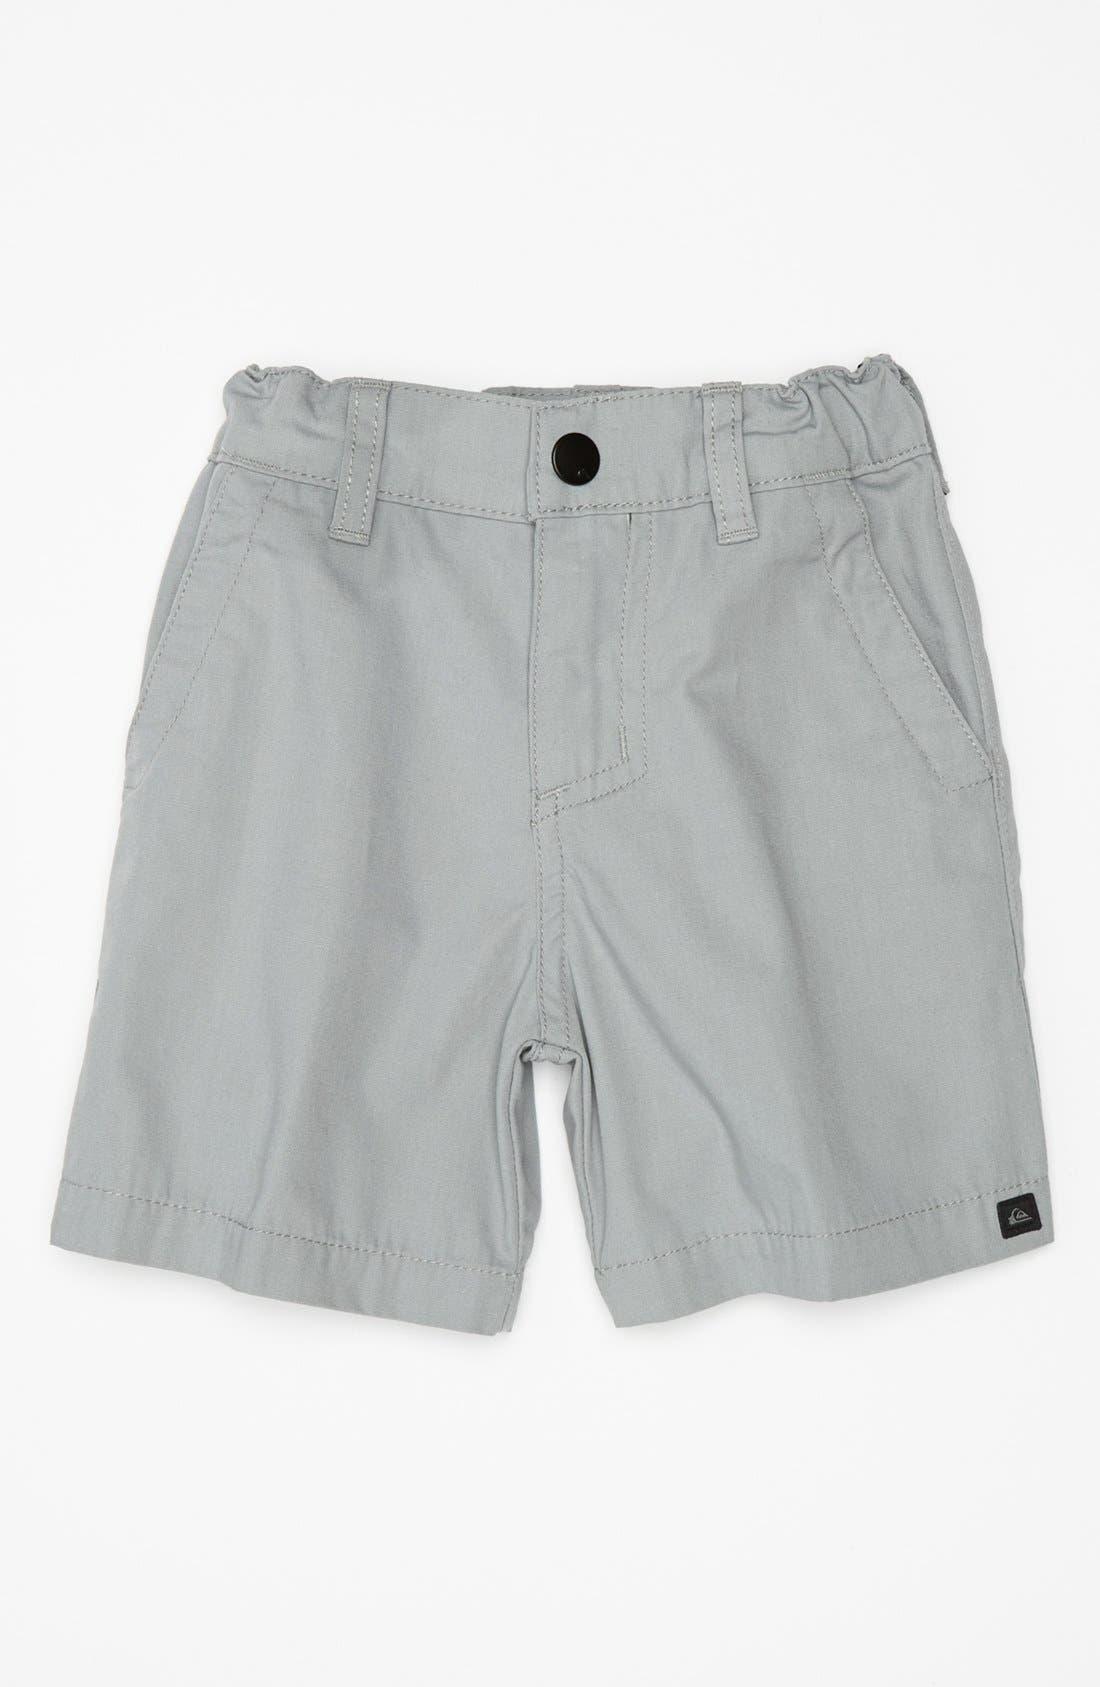 Main Image - Quiksilver 'Rockefeller' Shorts (Baby Boys)